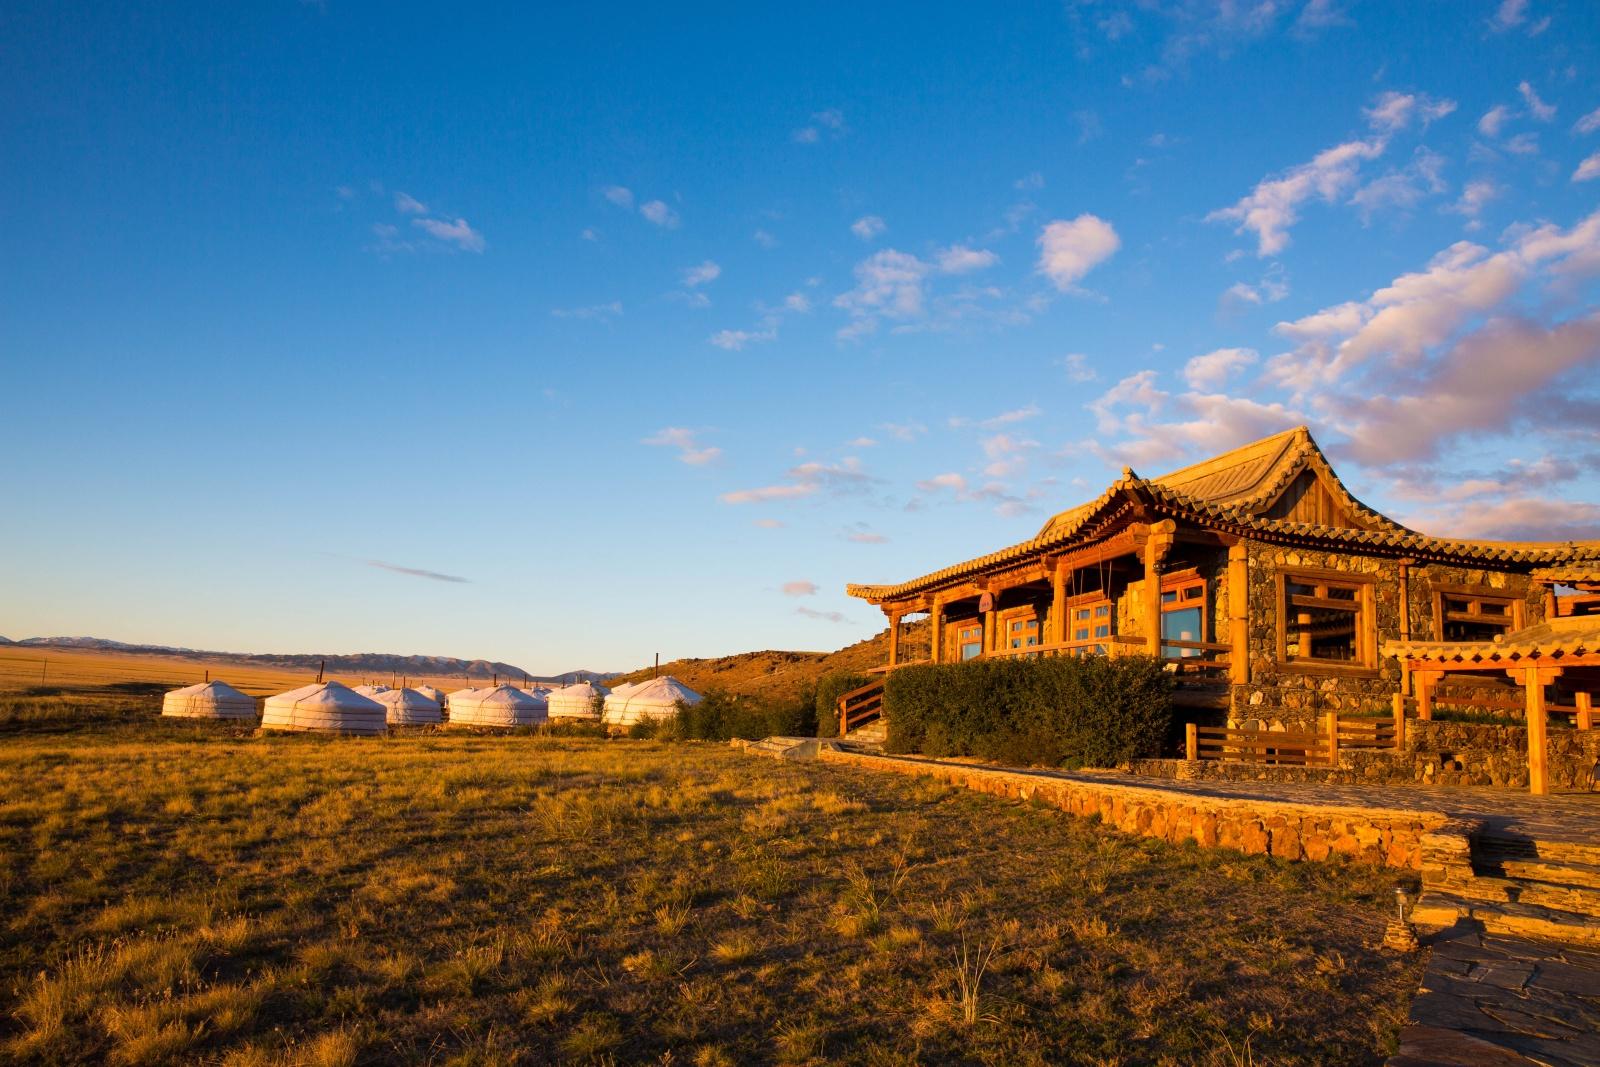 Exterior of Three Camel Lodge Mongolia